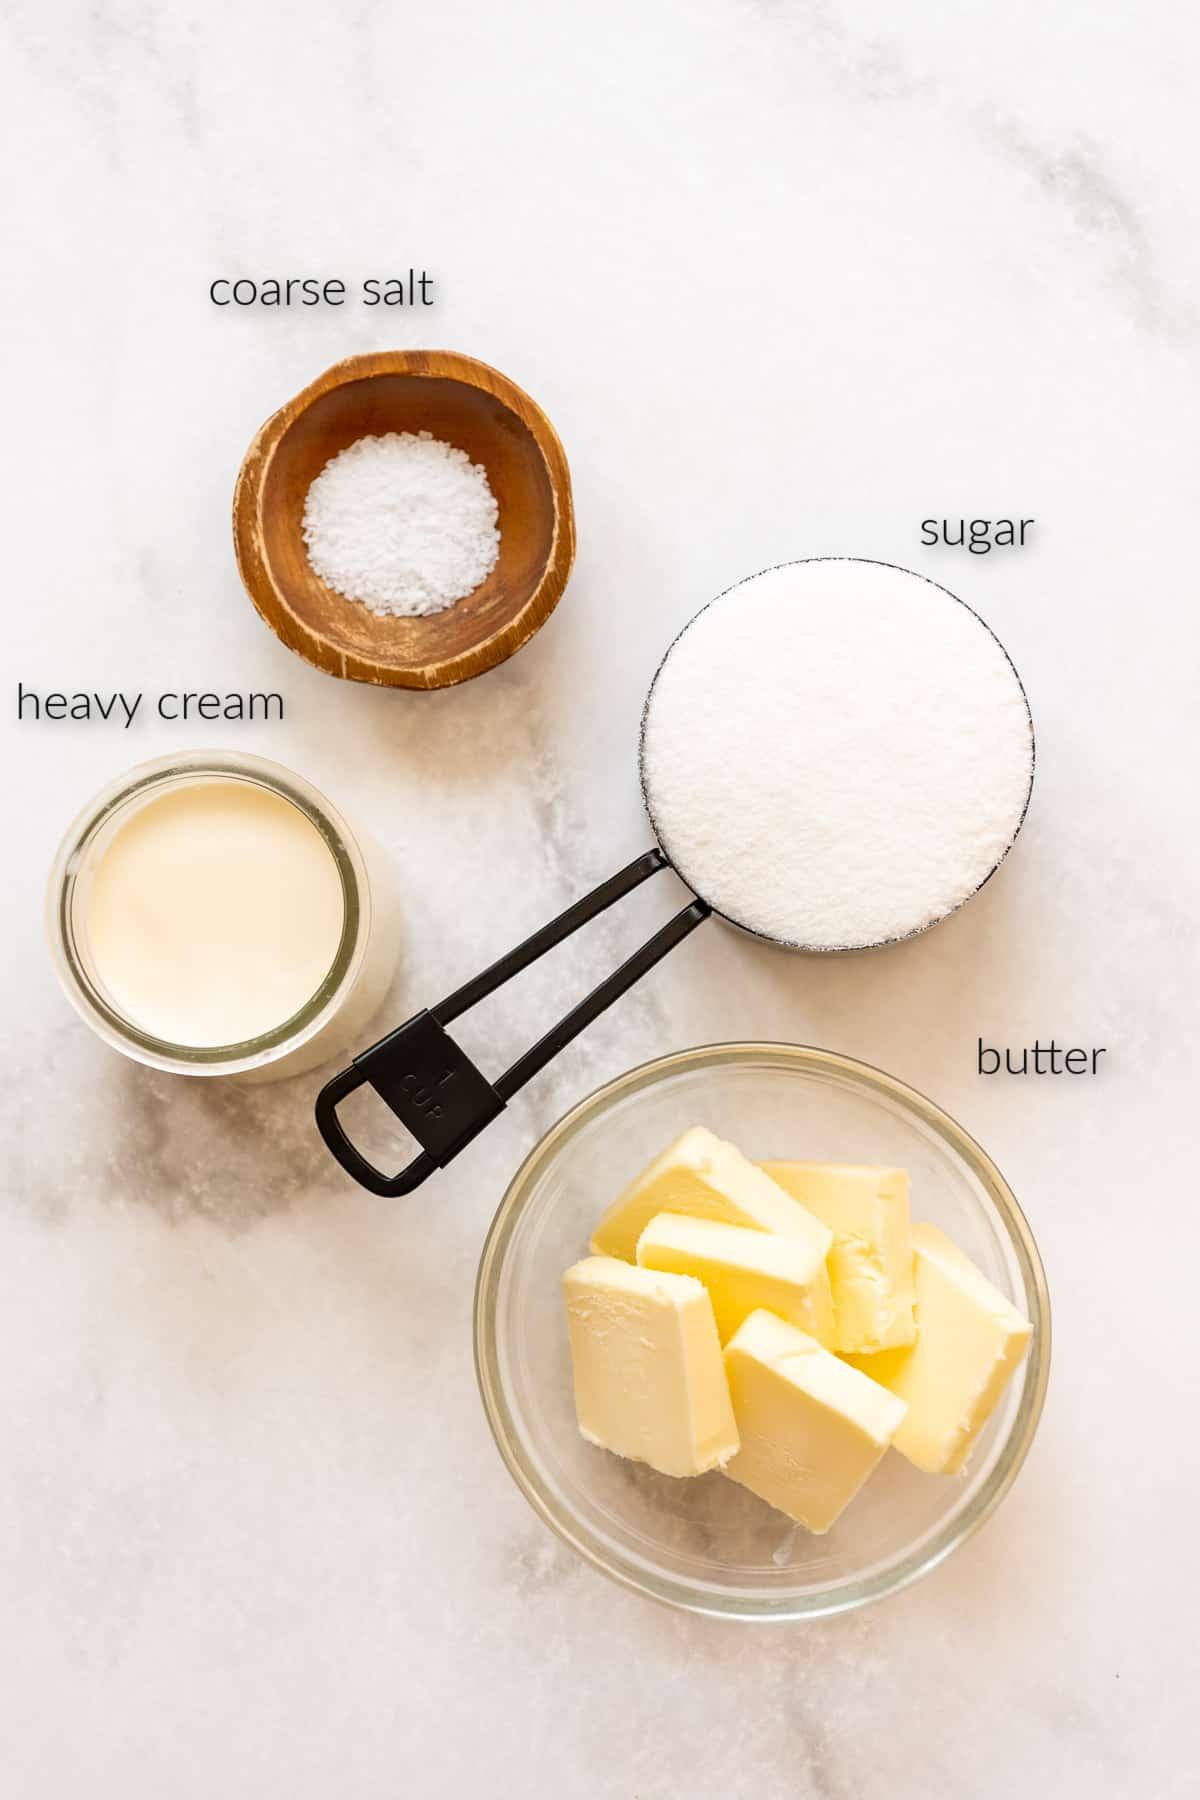 heavy cream, coarse salt, sugar, and butter for making caramel sauce